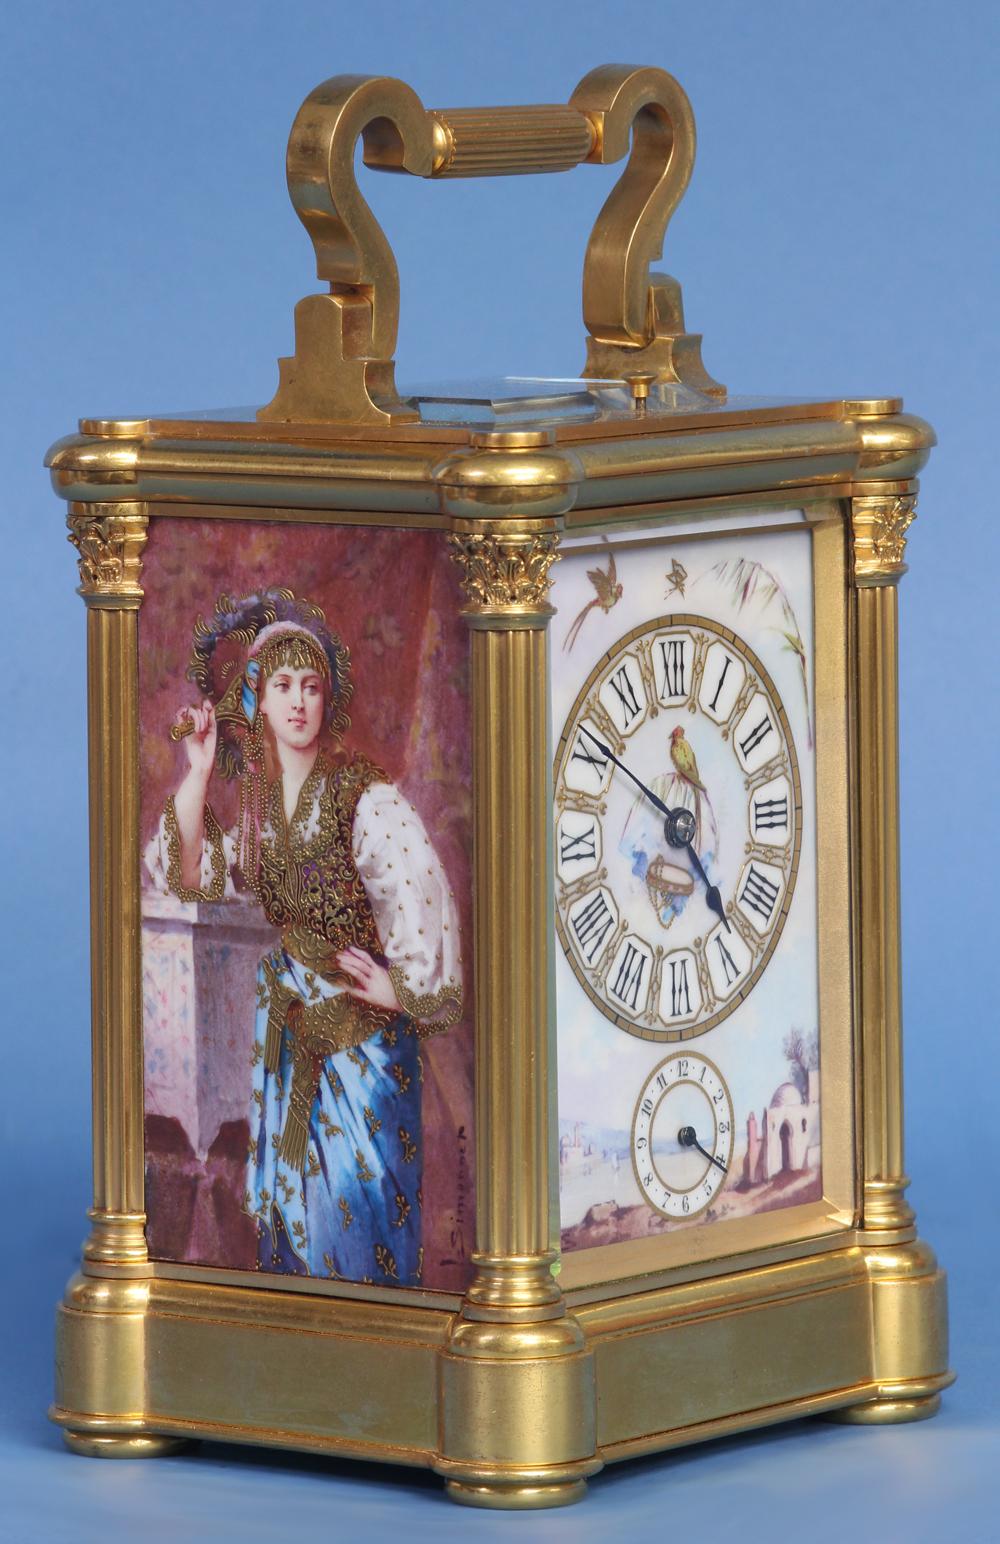 Carriage Clock with Porcelain Panels by L. Simonnet.